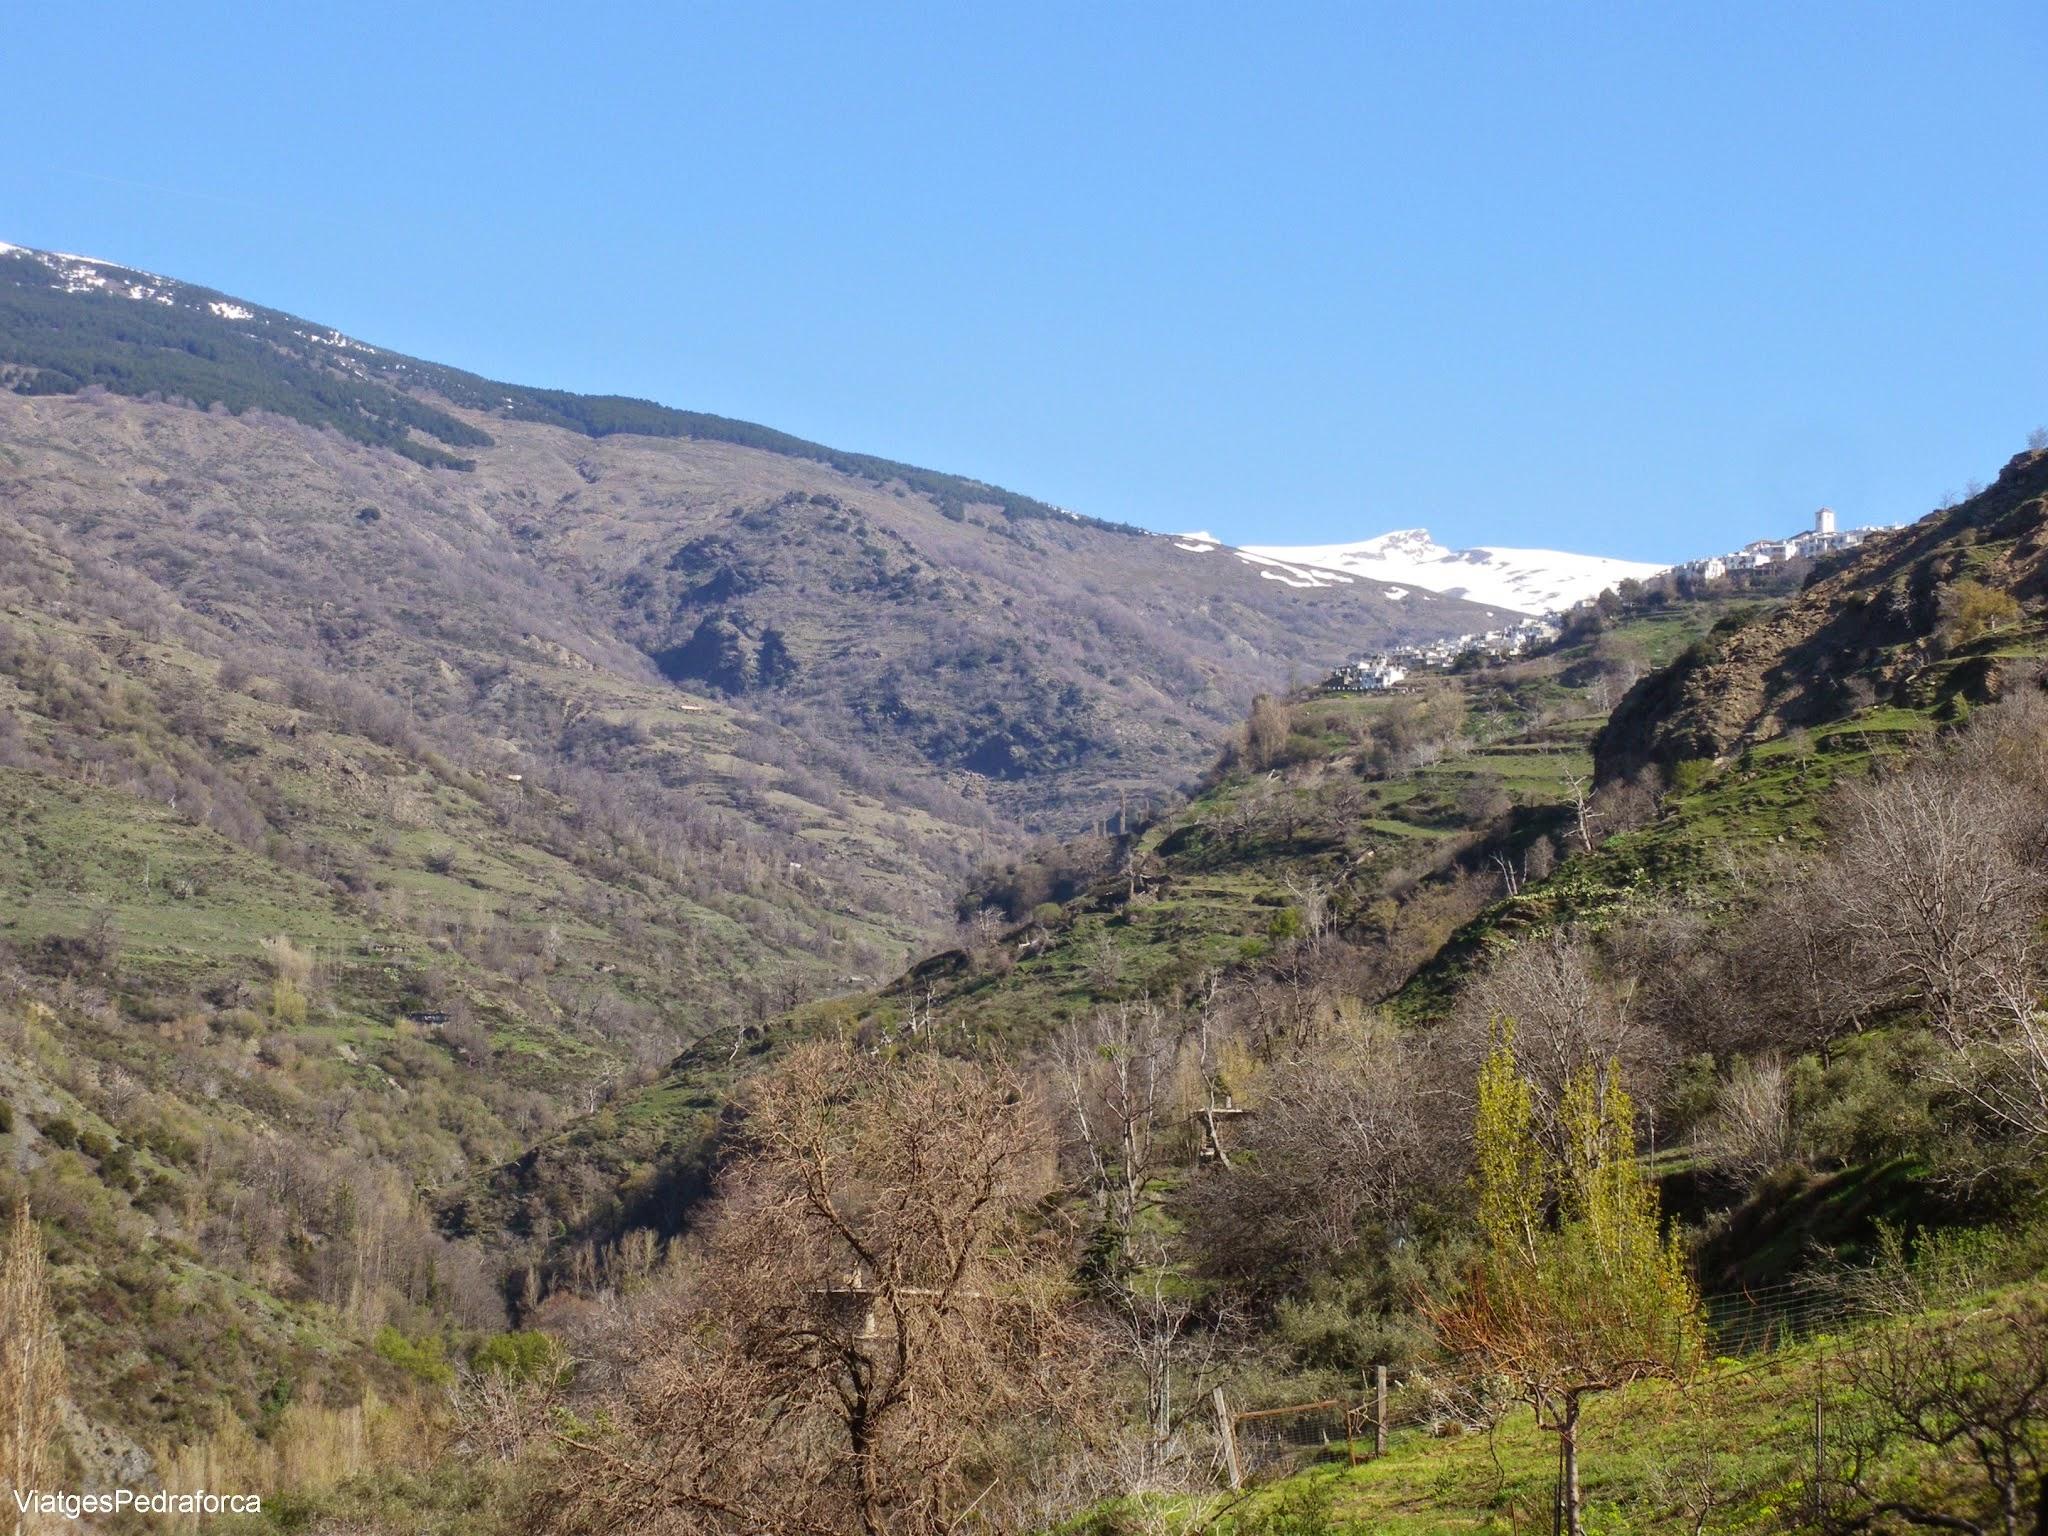 Alpujarra Granadina Barranco del Poqueira Andalucia Sierra Nevada